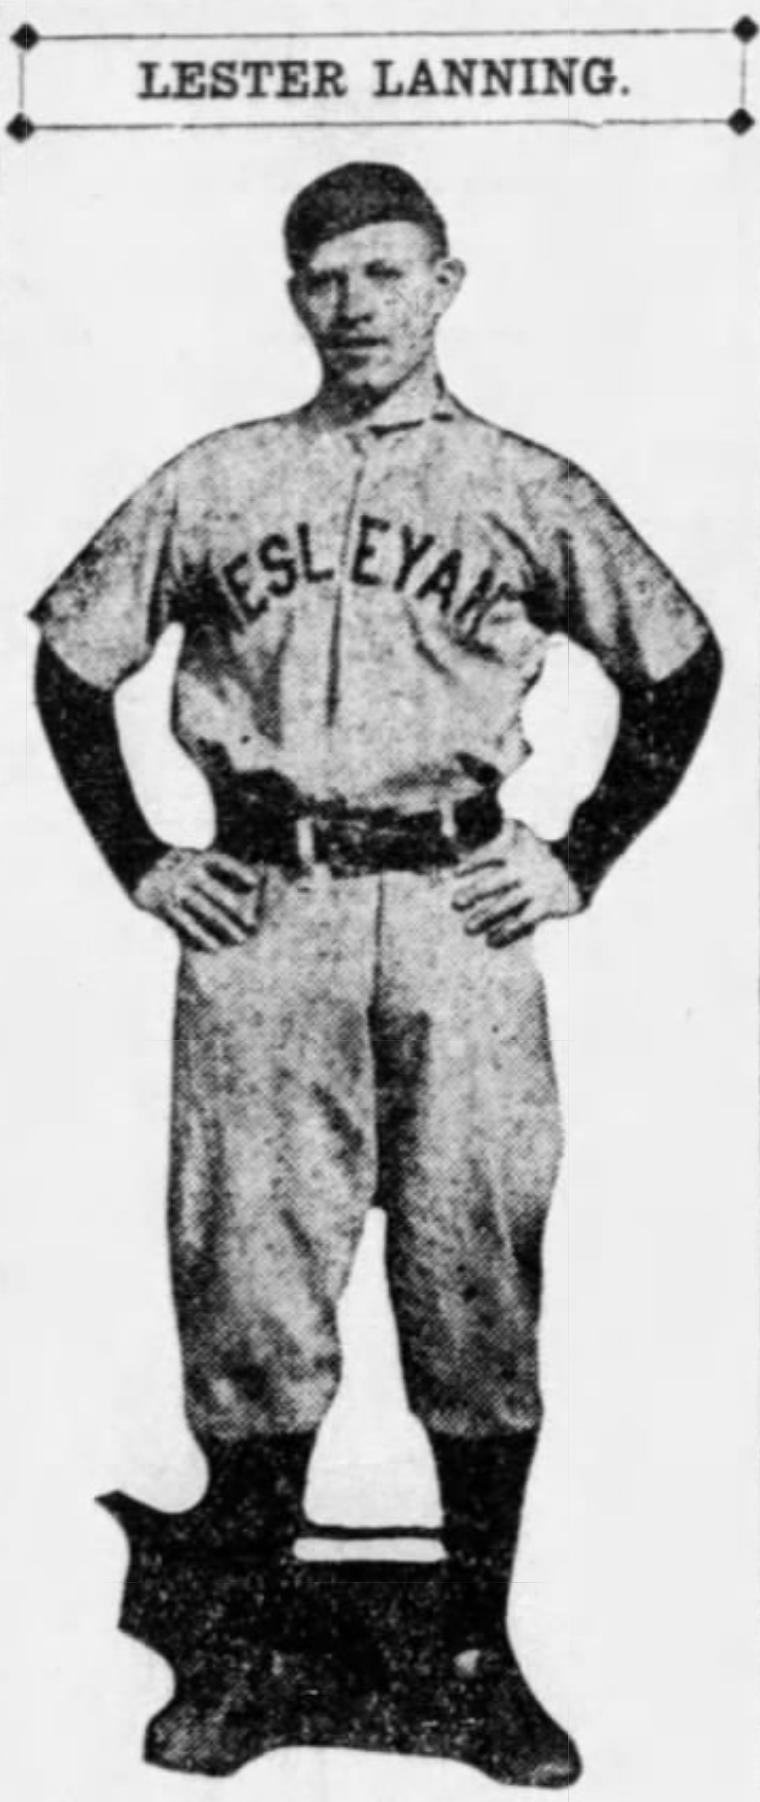 Lester Lanning, Outfielder, Hartford Poli's and Wesleyan University graduate, 1917.